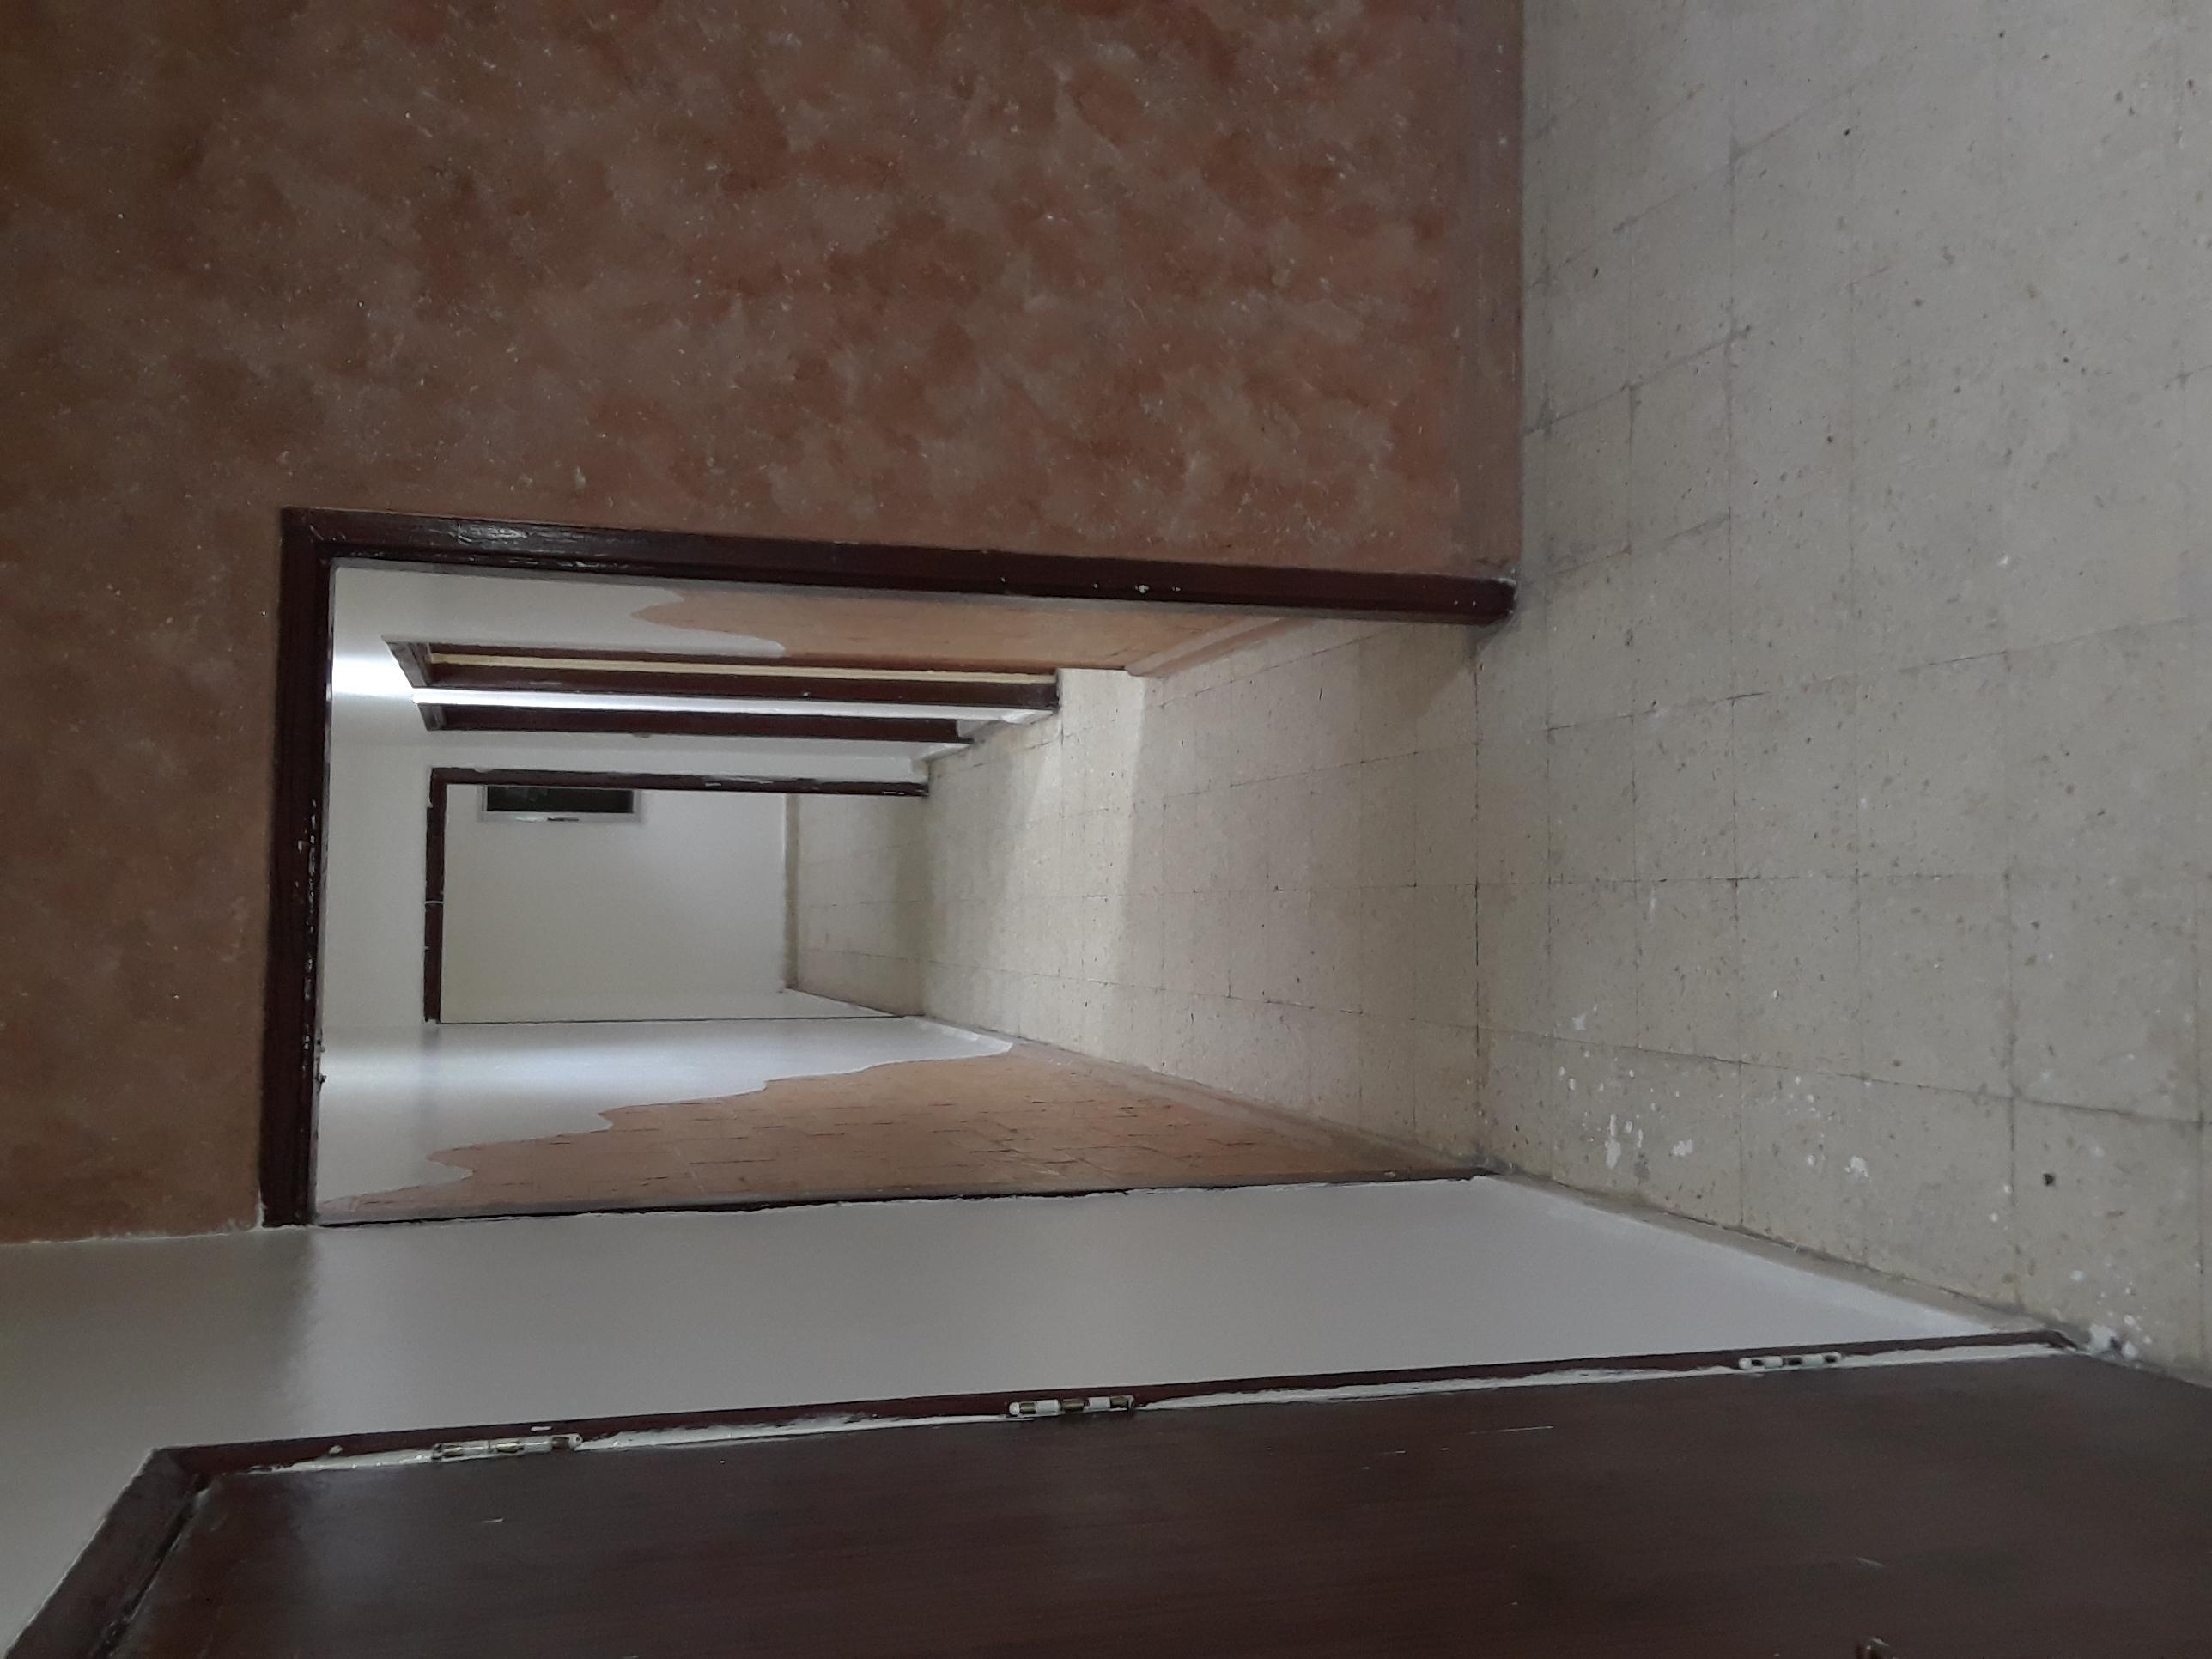 Amazing Deal |Massive | Desirable Location | Grab Now!-  شقة للايجار في ام نوارة...